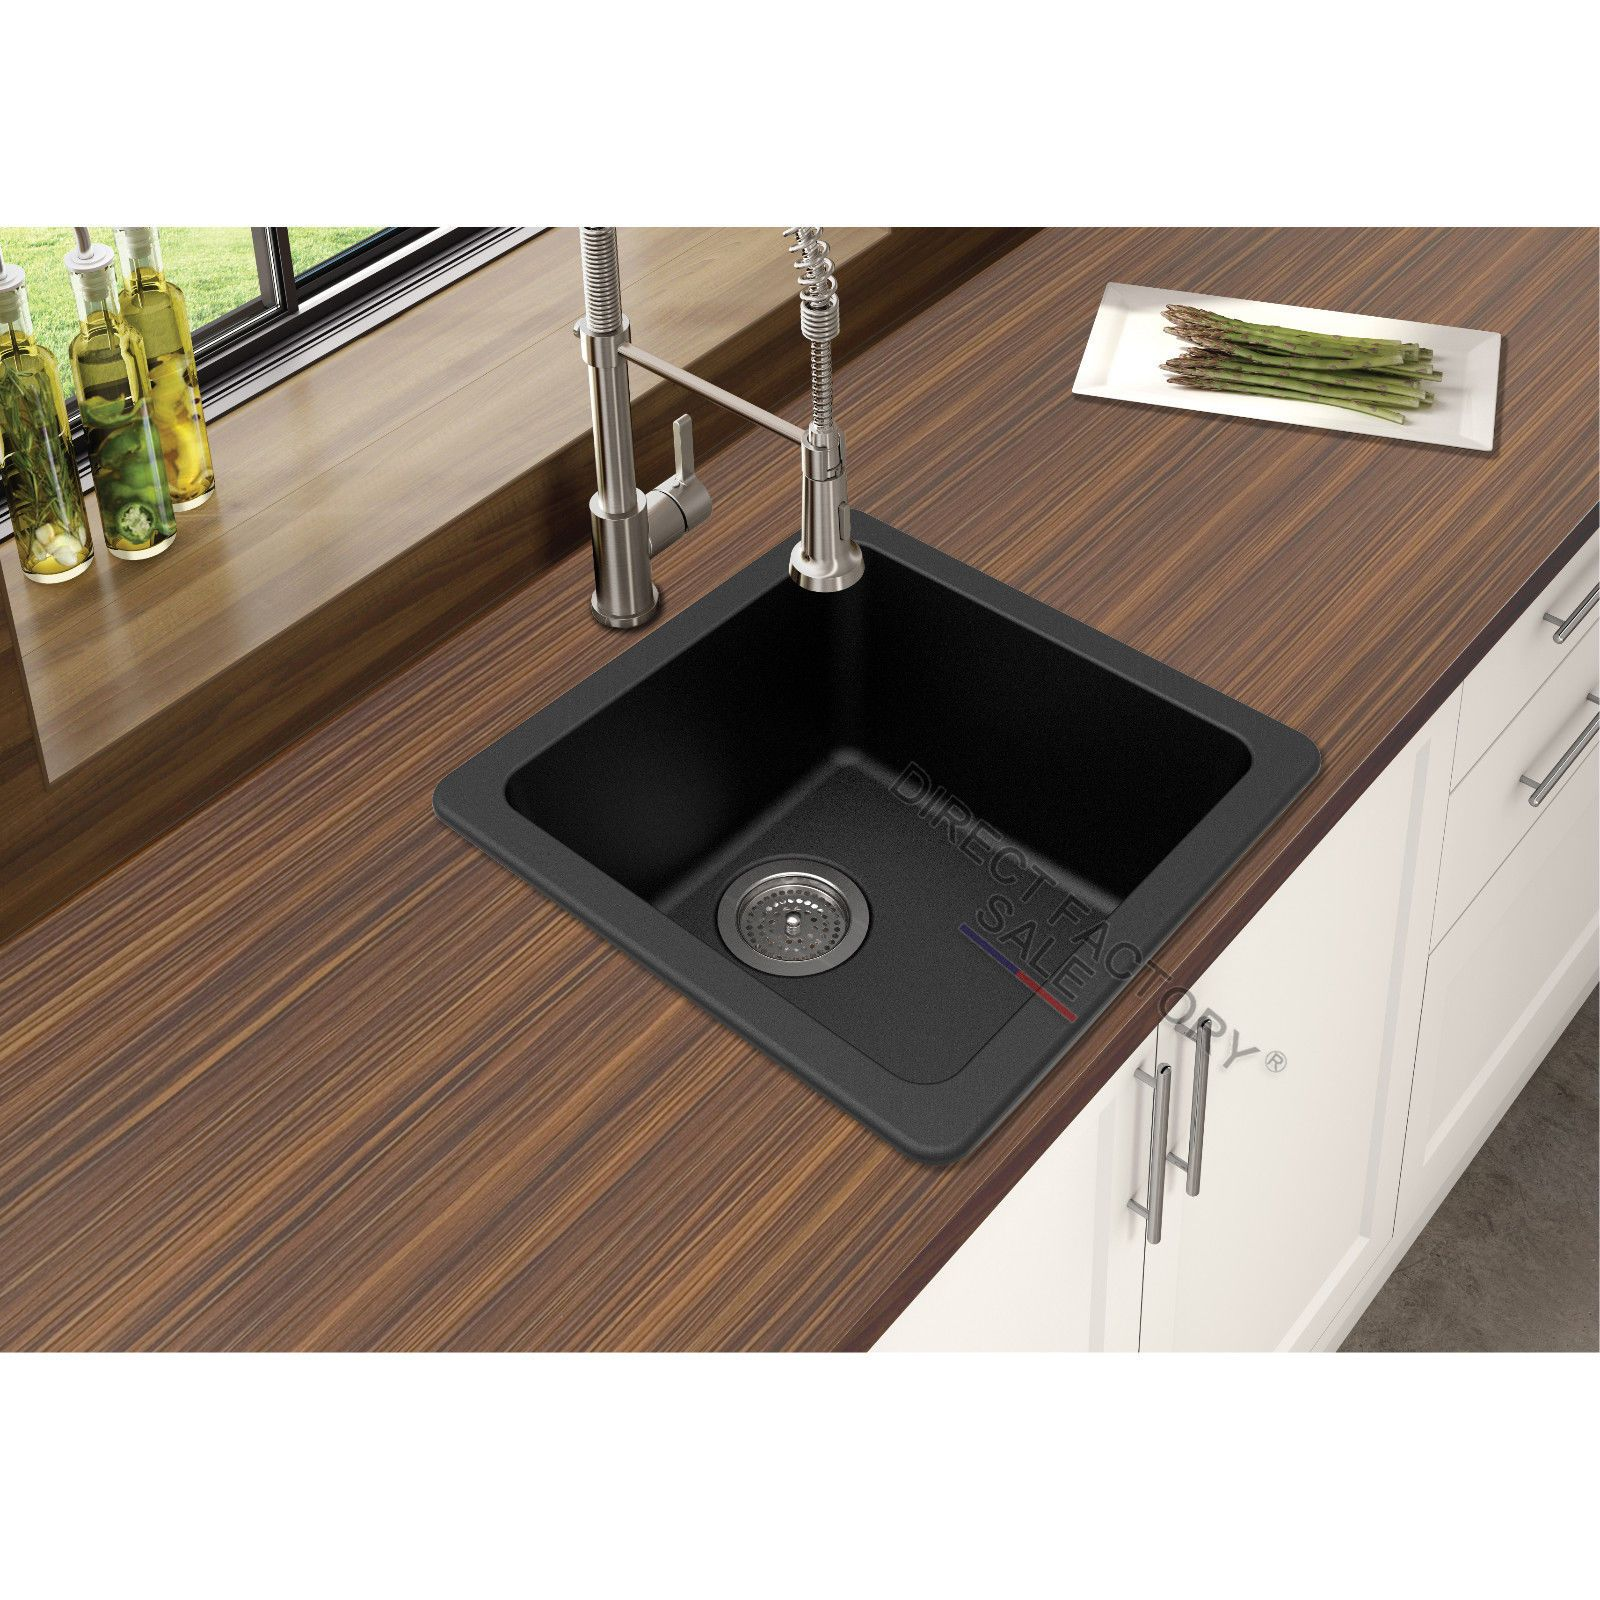 Details about Black White Granite Stone Kitchen Laundry